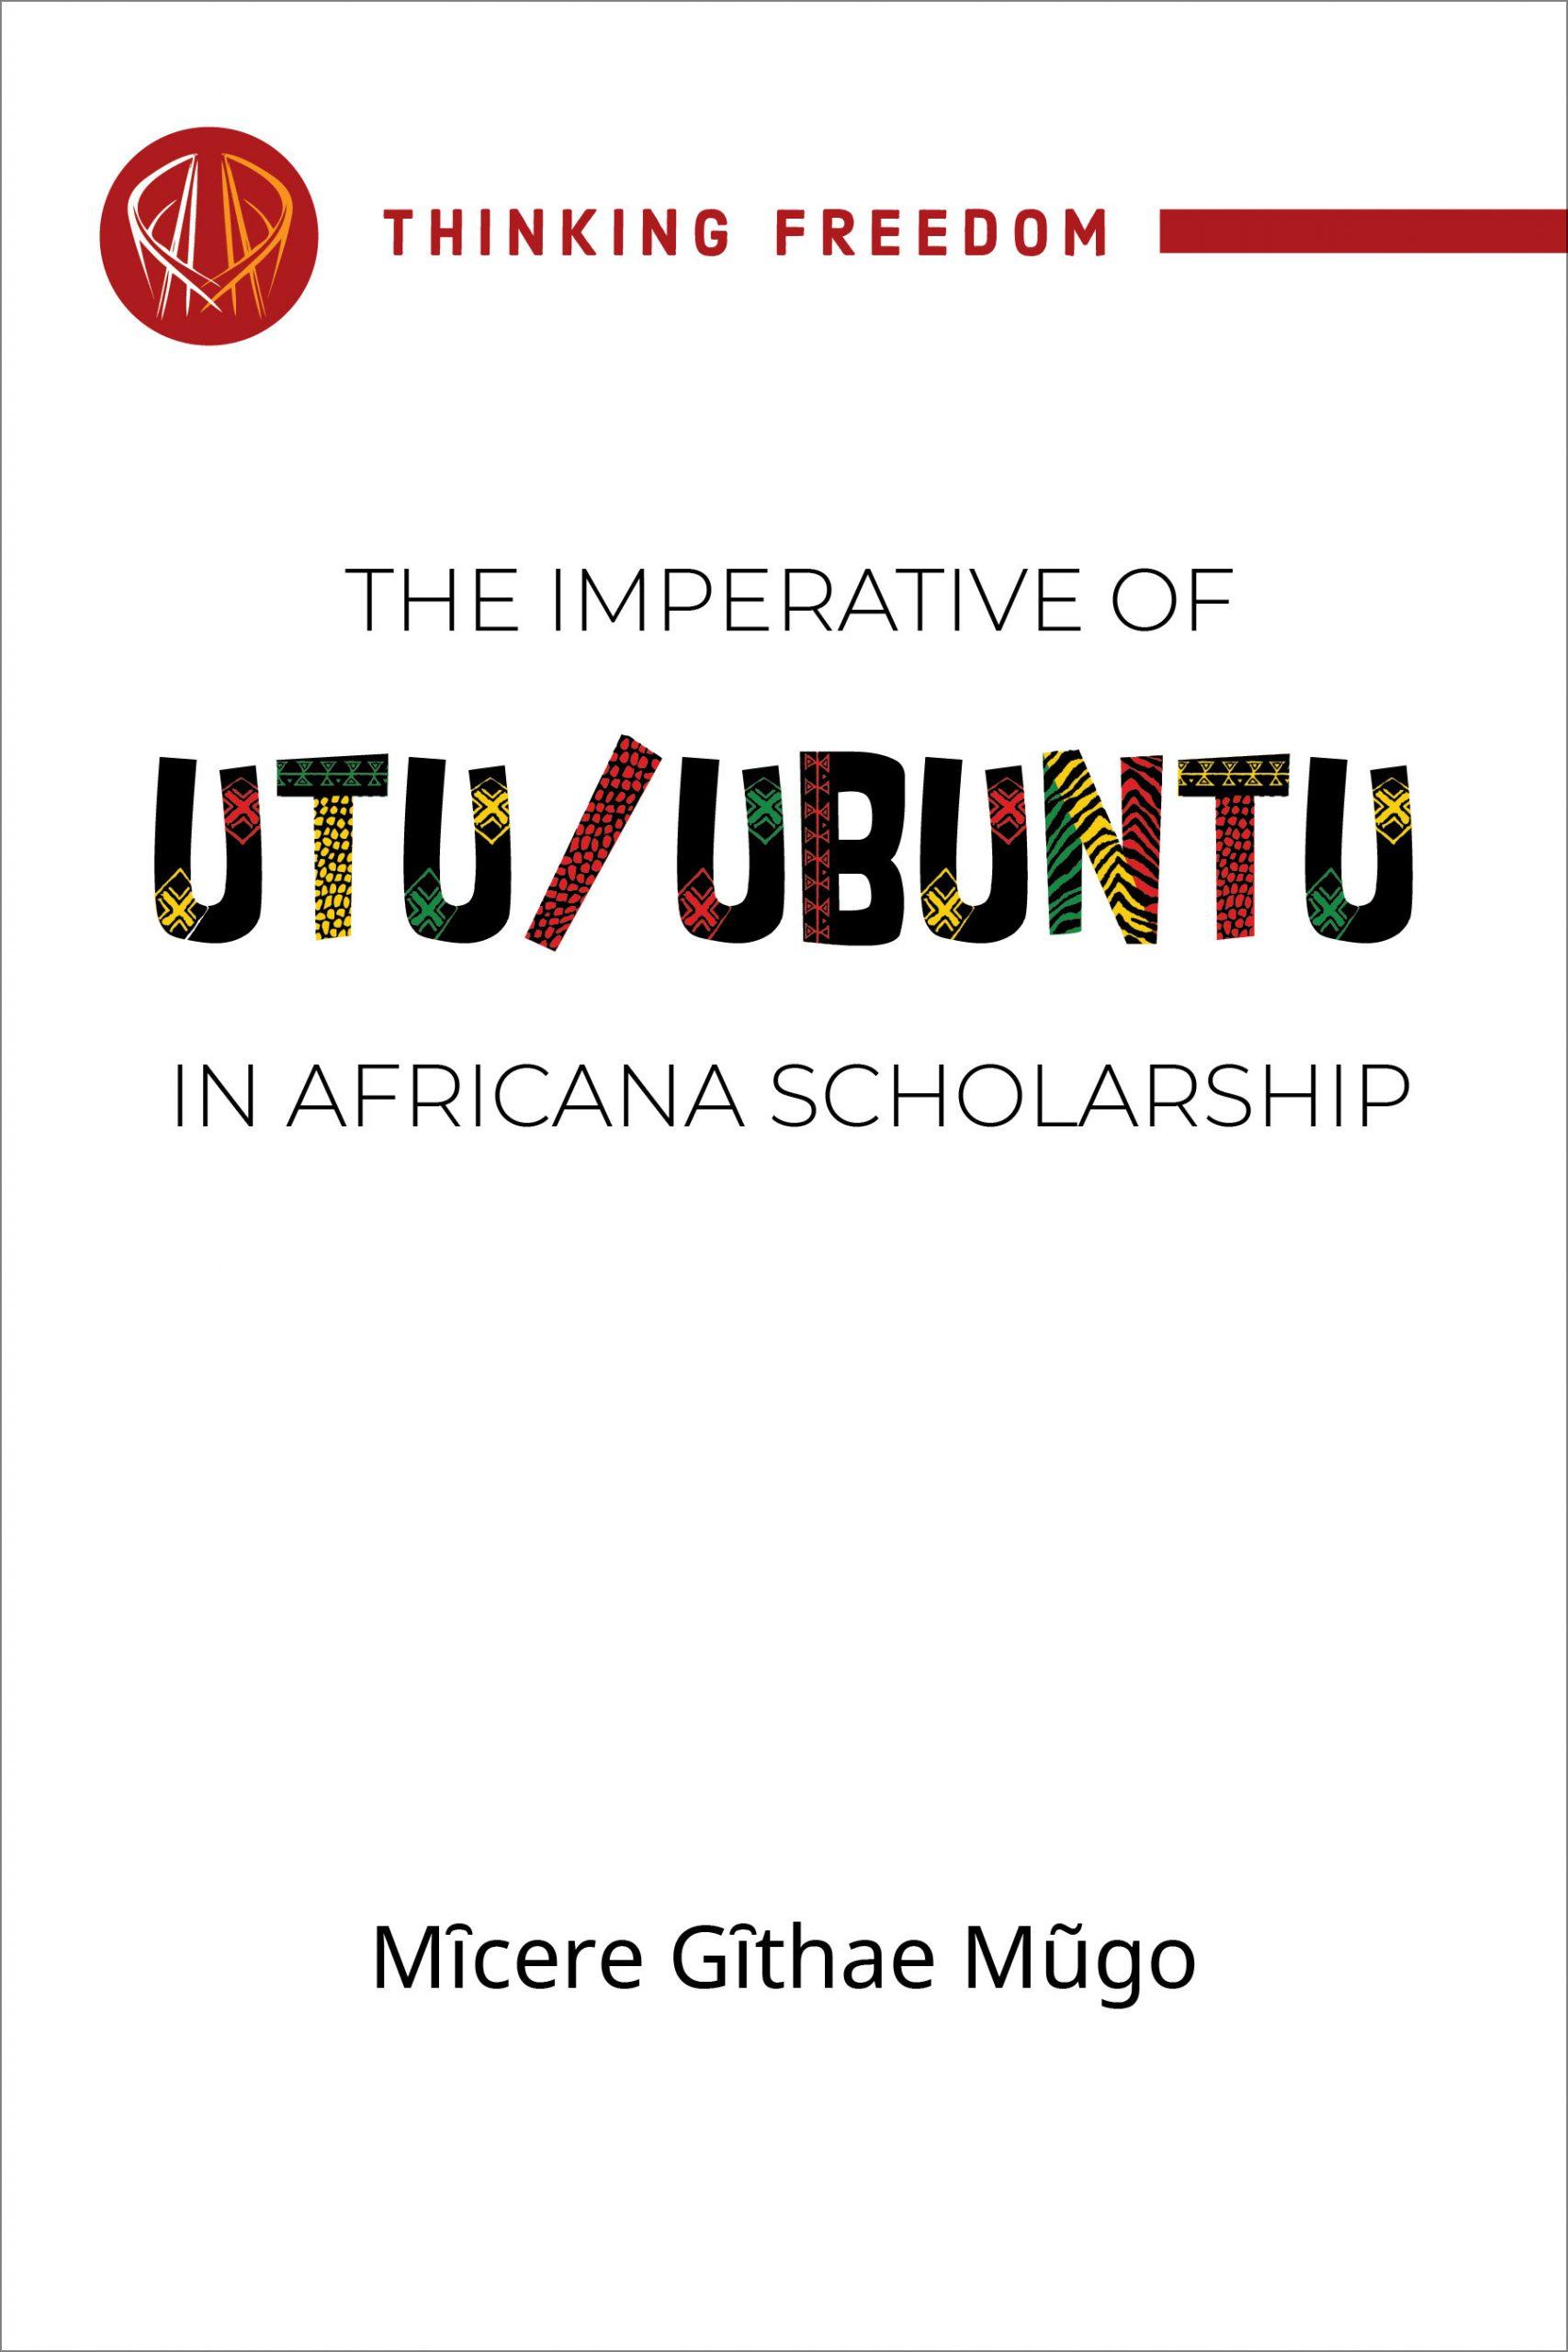 The imperative of Utu/Ubuntu in Africana Scholarship